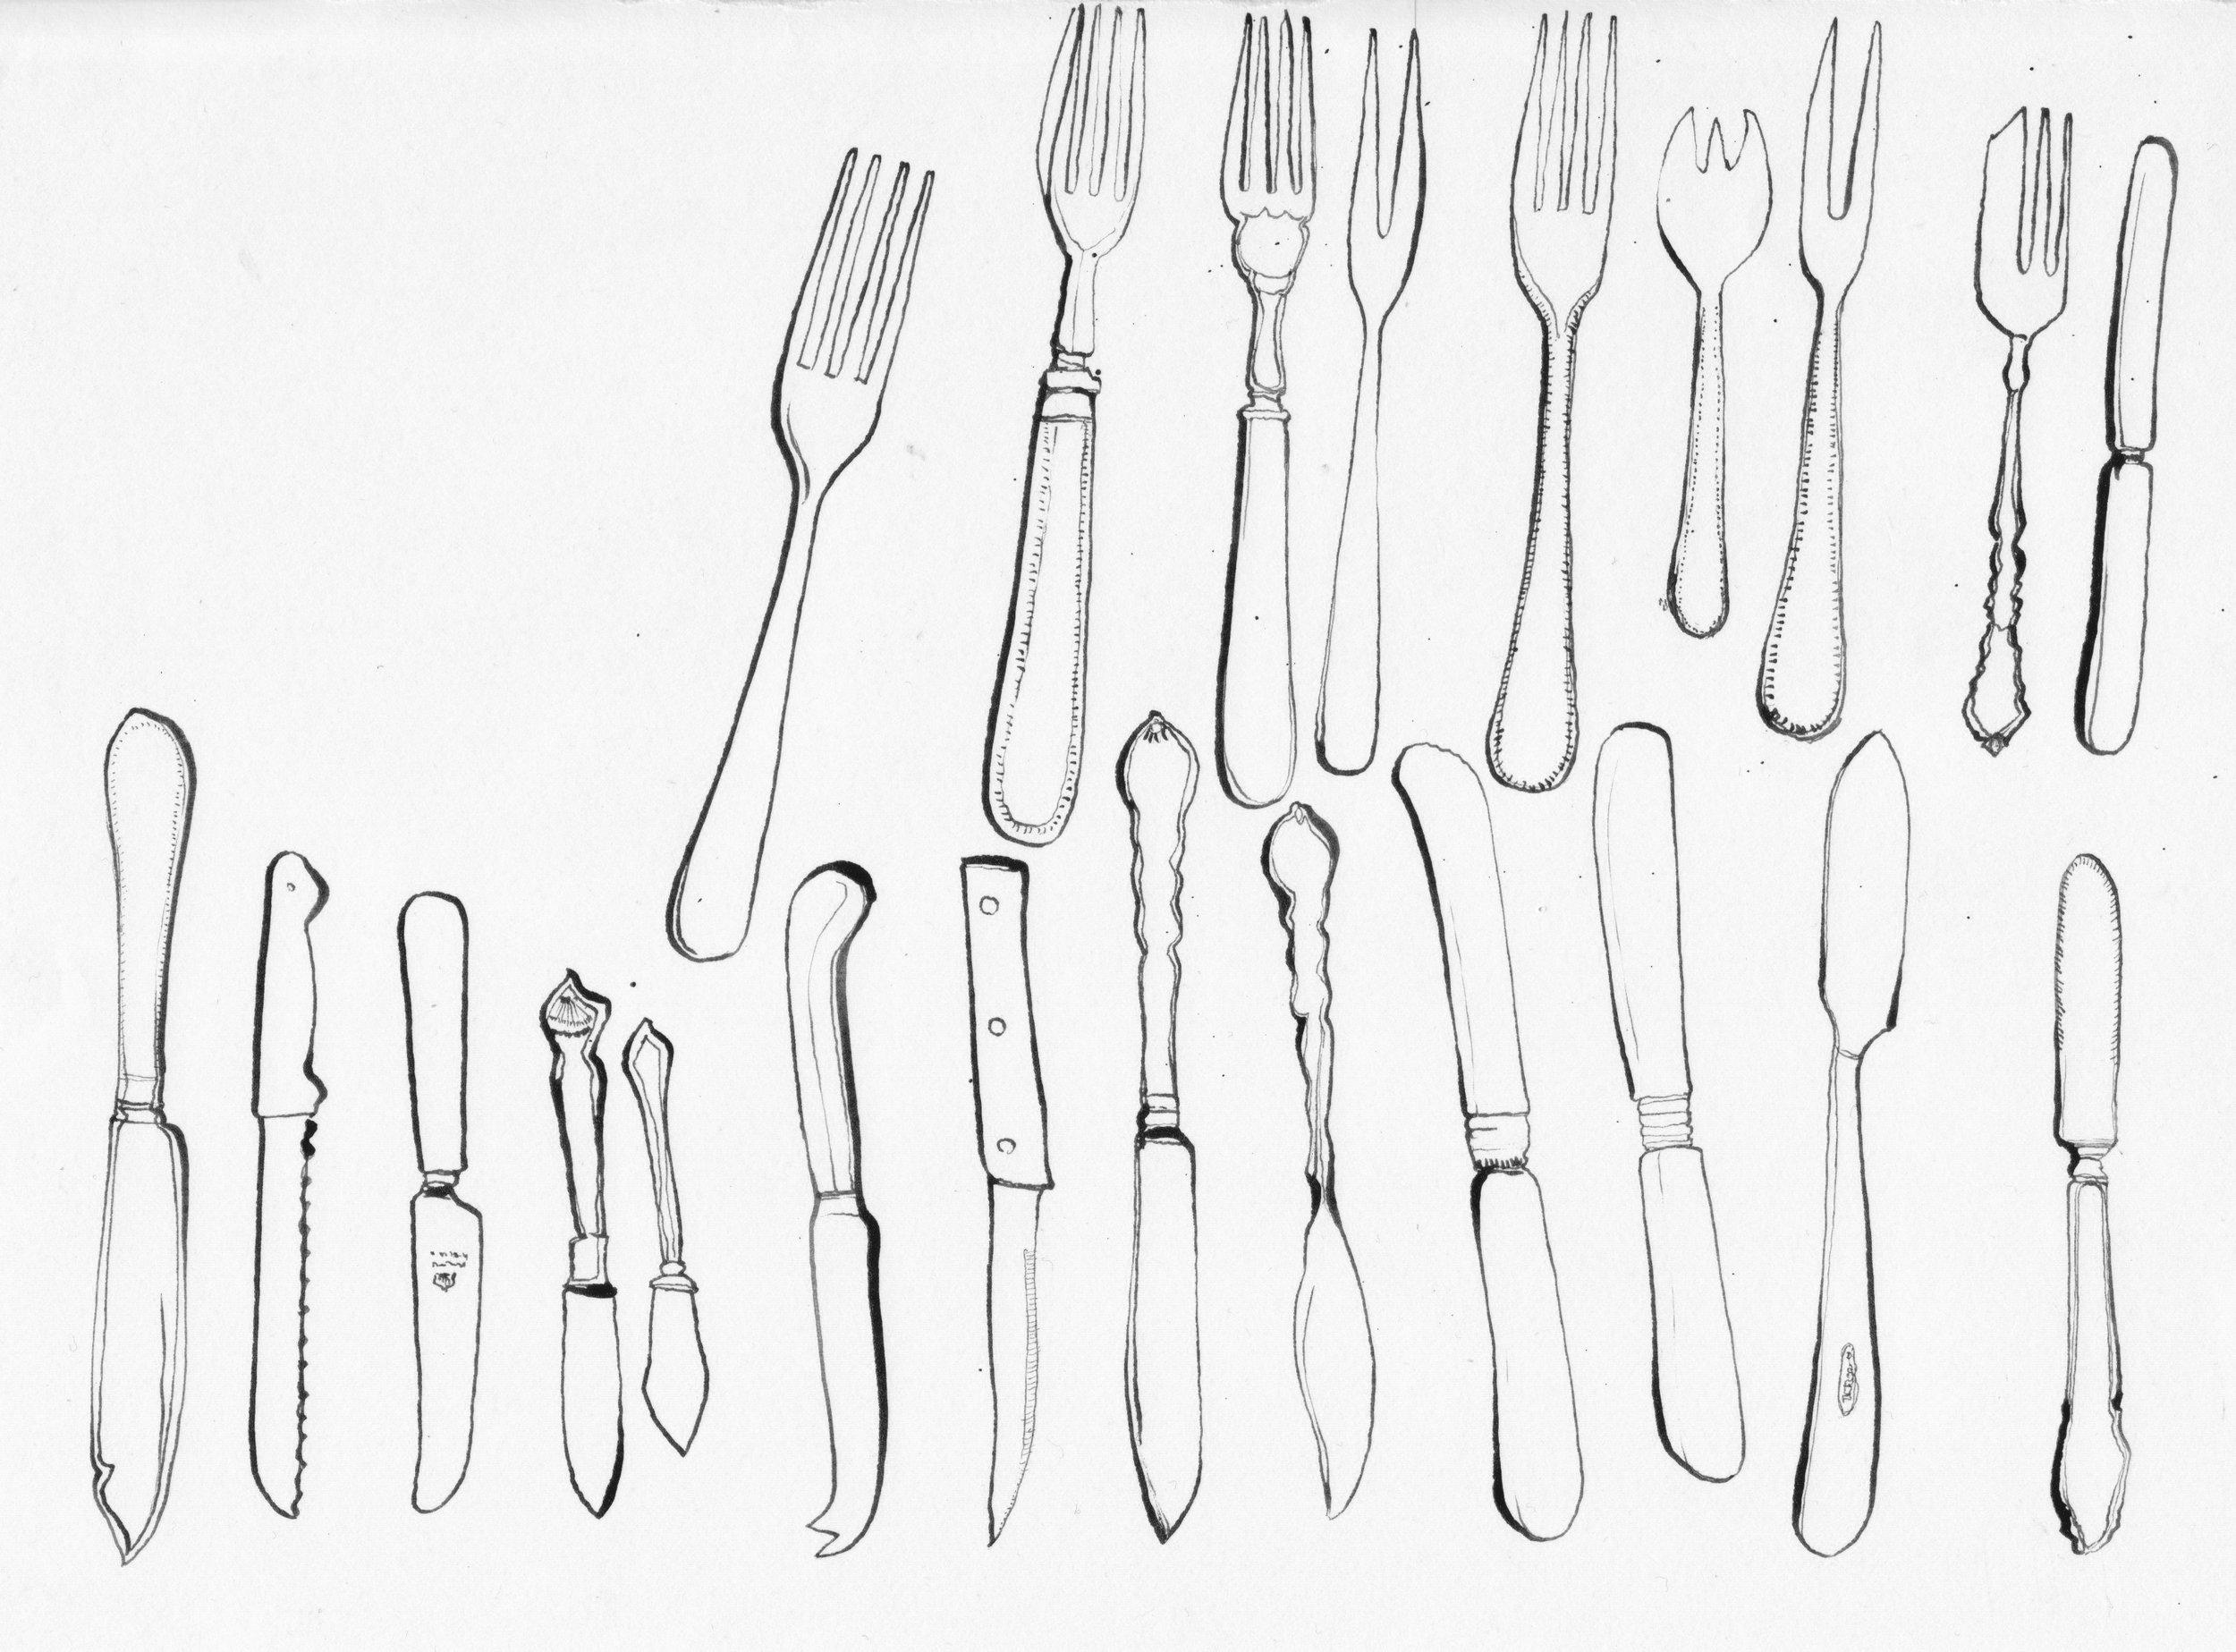 cutlery2.jpg